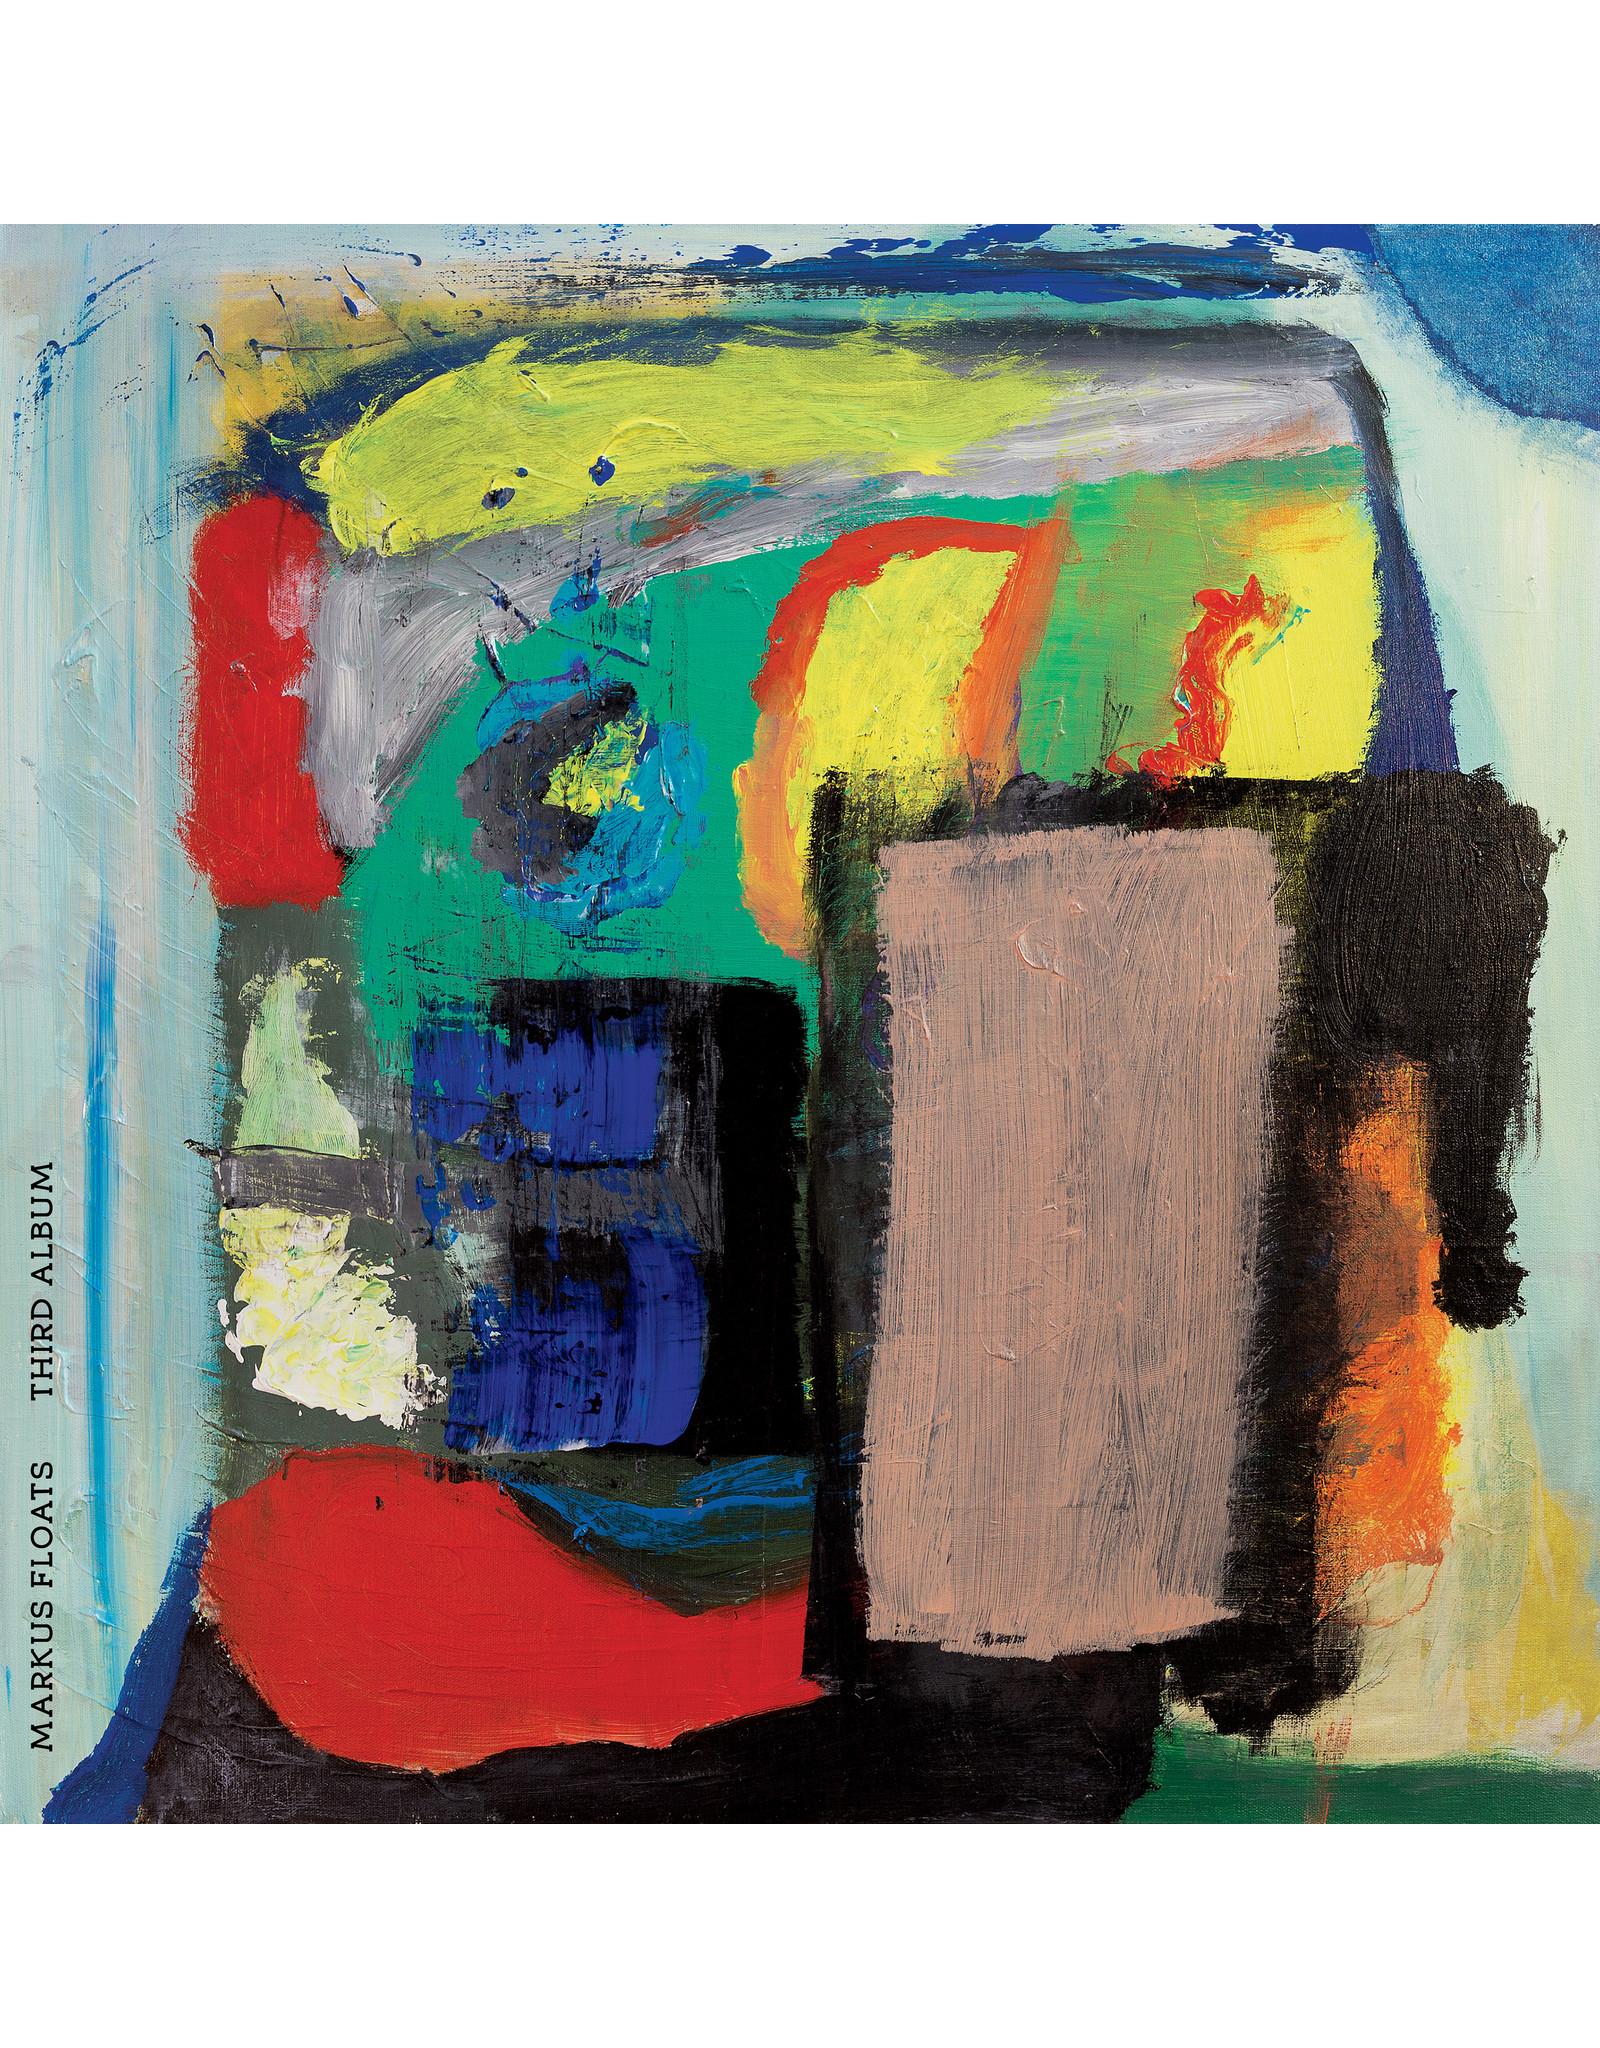 New Vinyl Markus Floats - Third Album LP